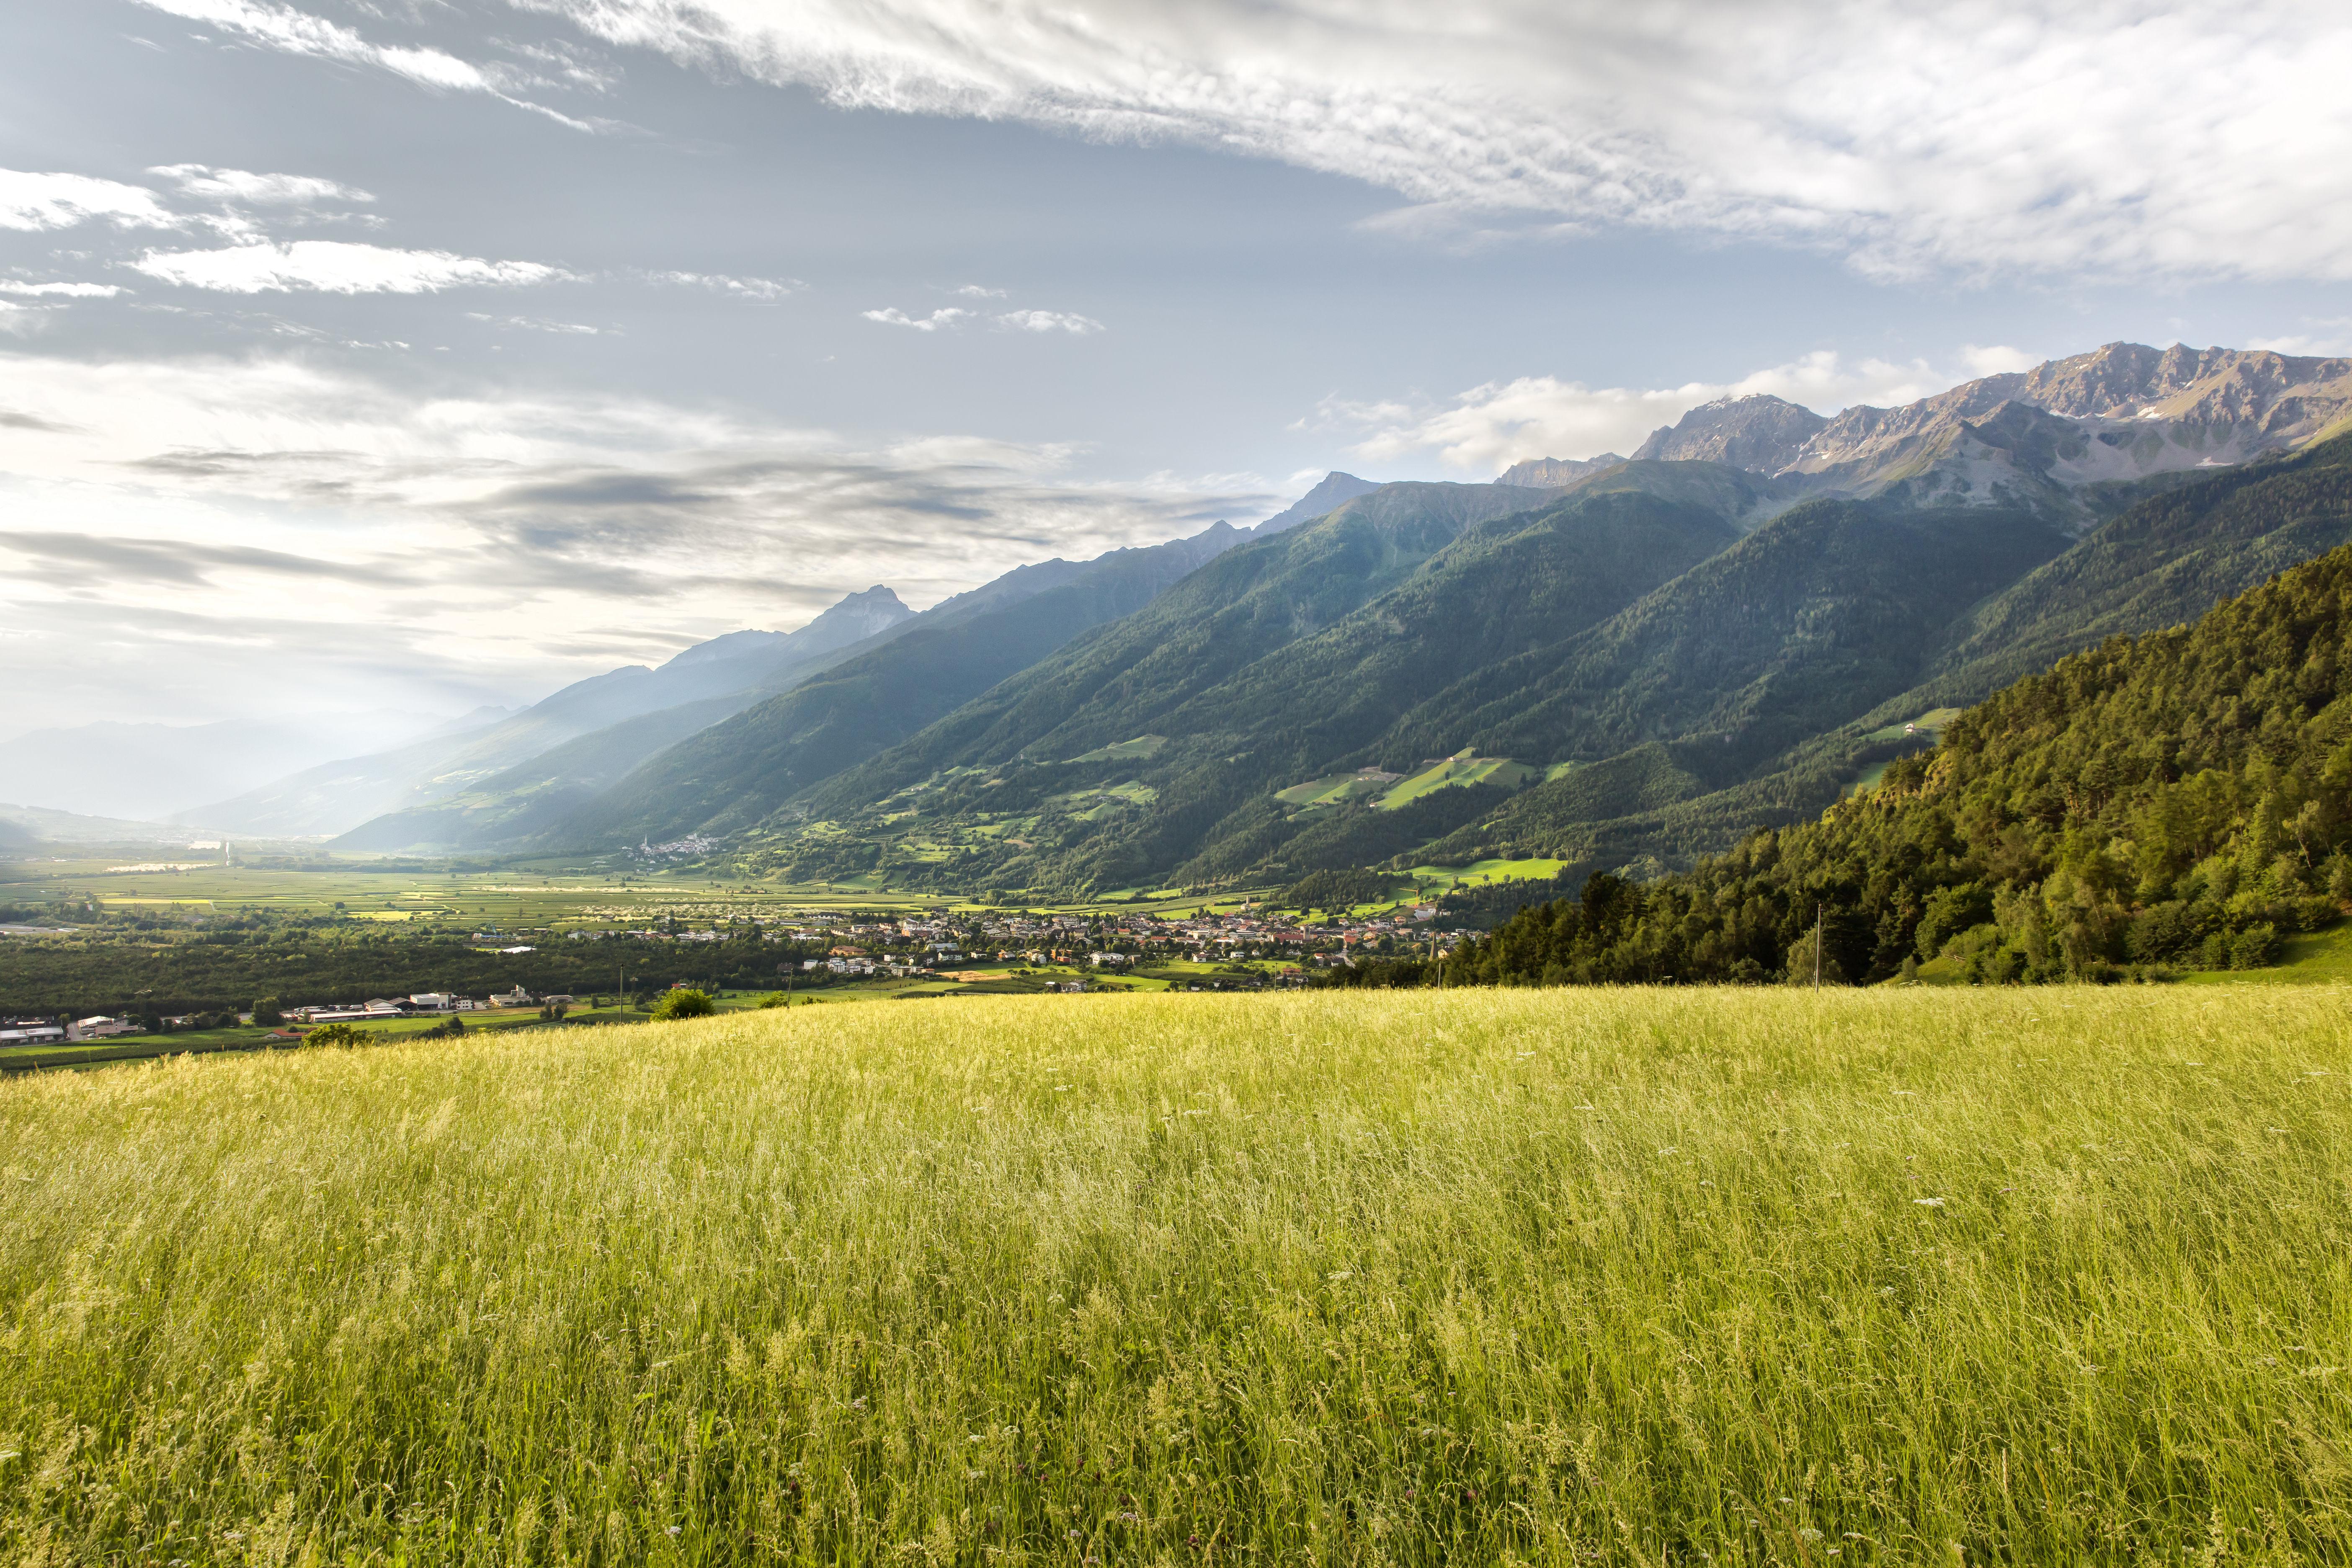 mountainbiken-montoni-tour-vinschgau-fb